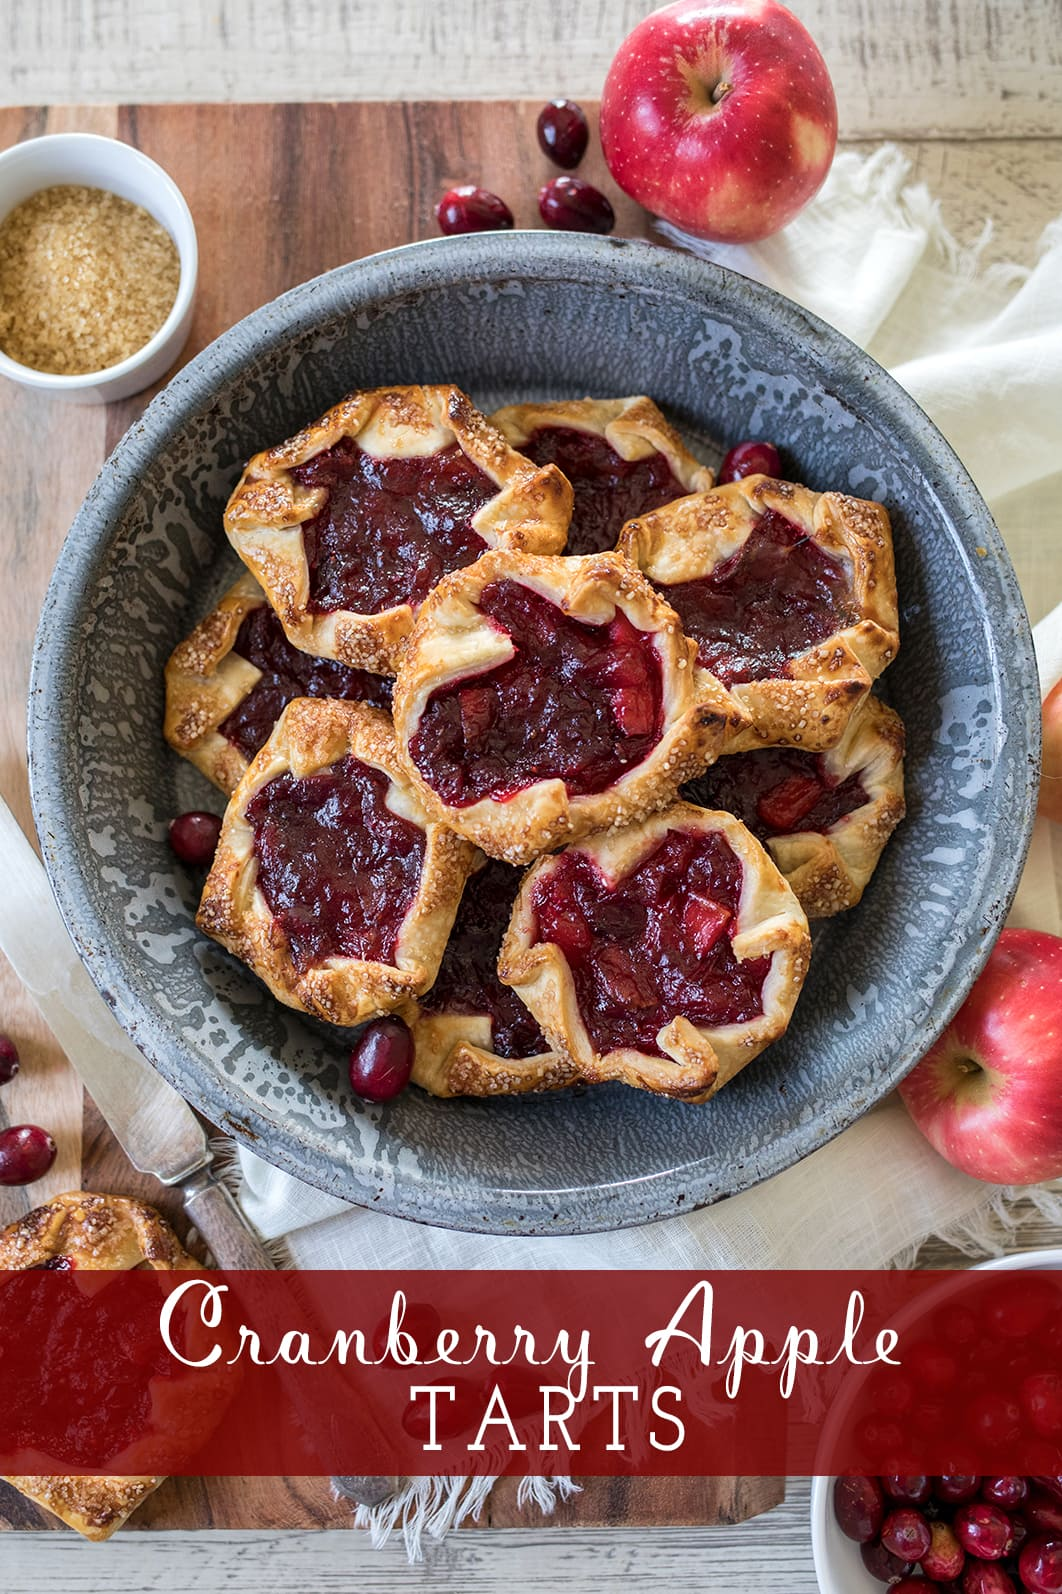 Easy Cranberry Apple Tarts #Thanksgiving #cranberrytart #easypie #thanksgivingpie